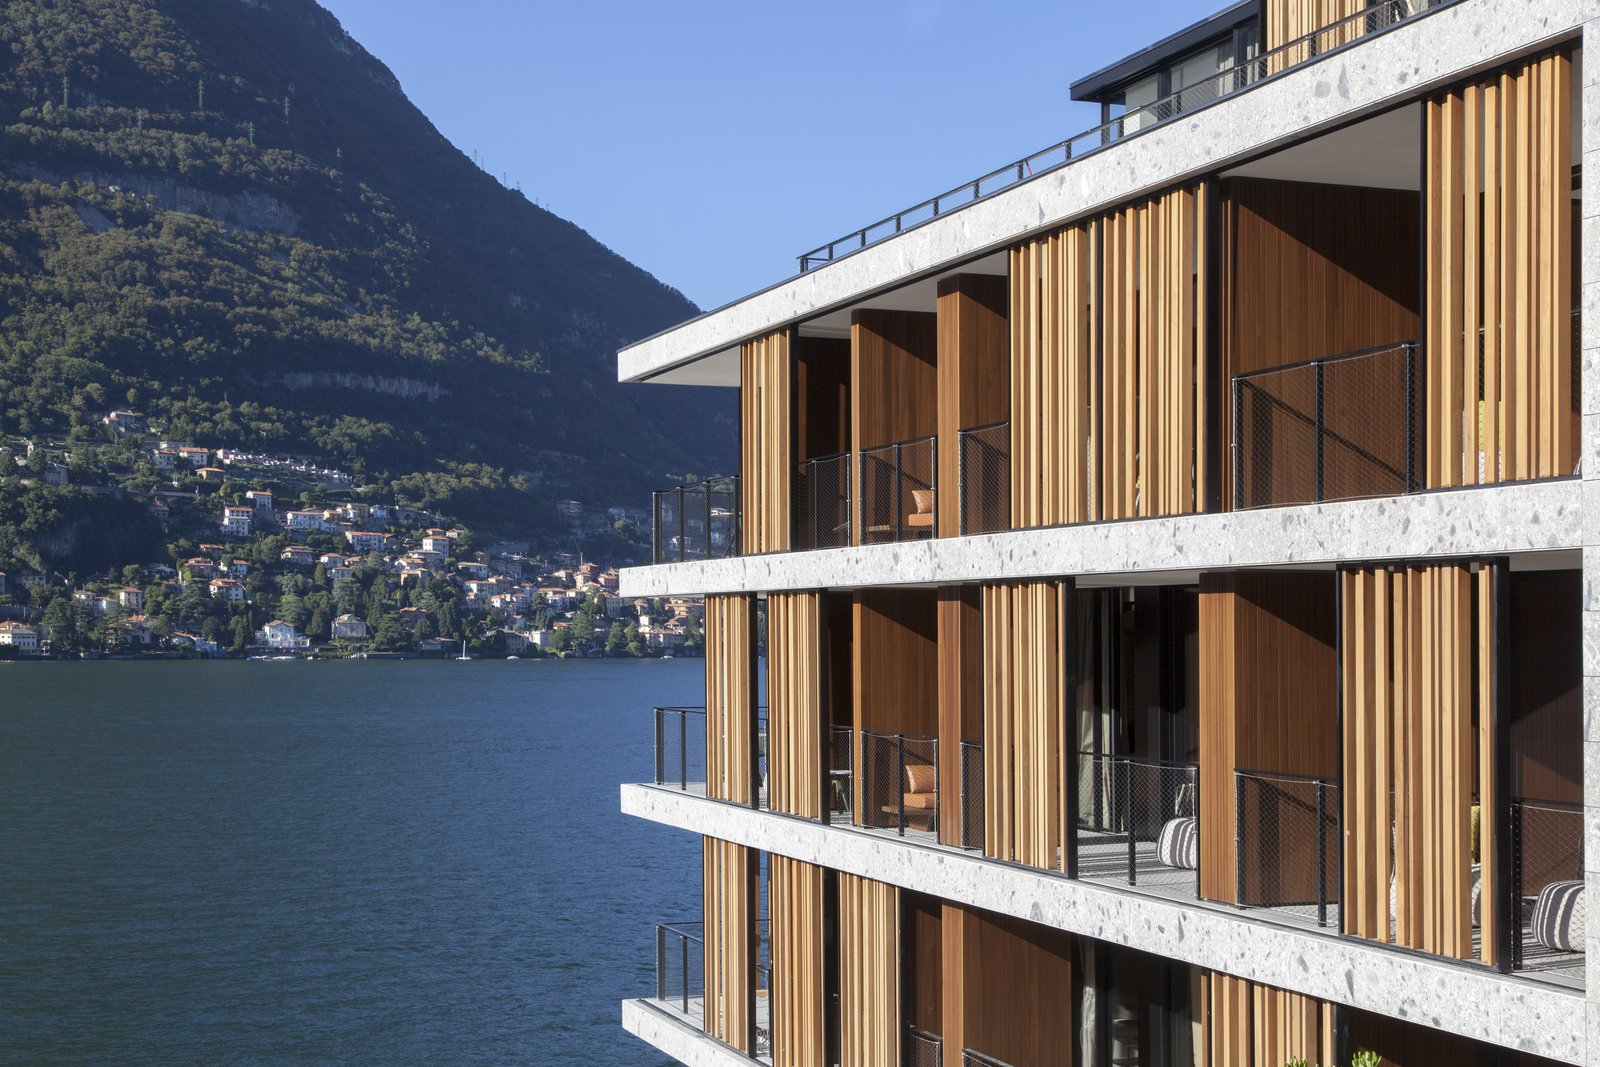 Photo 1 of 12 in A Modern Lake Como Retreat Designed by Patricia Urquiola